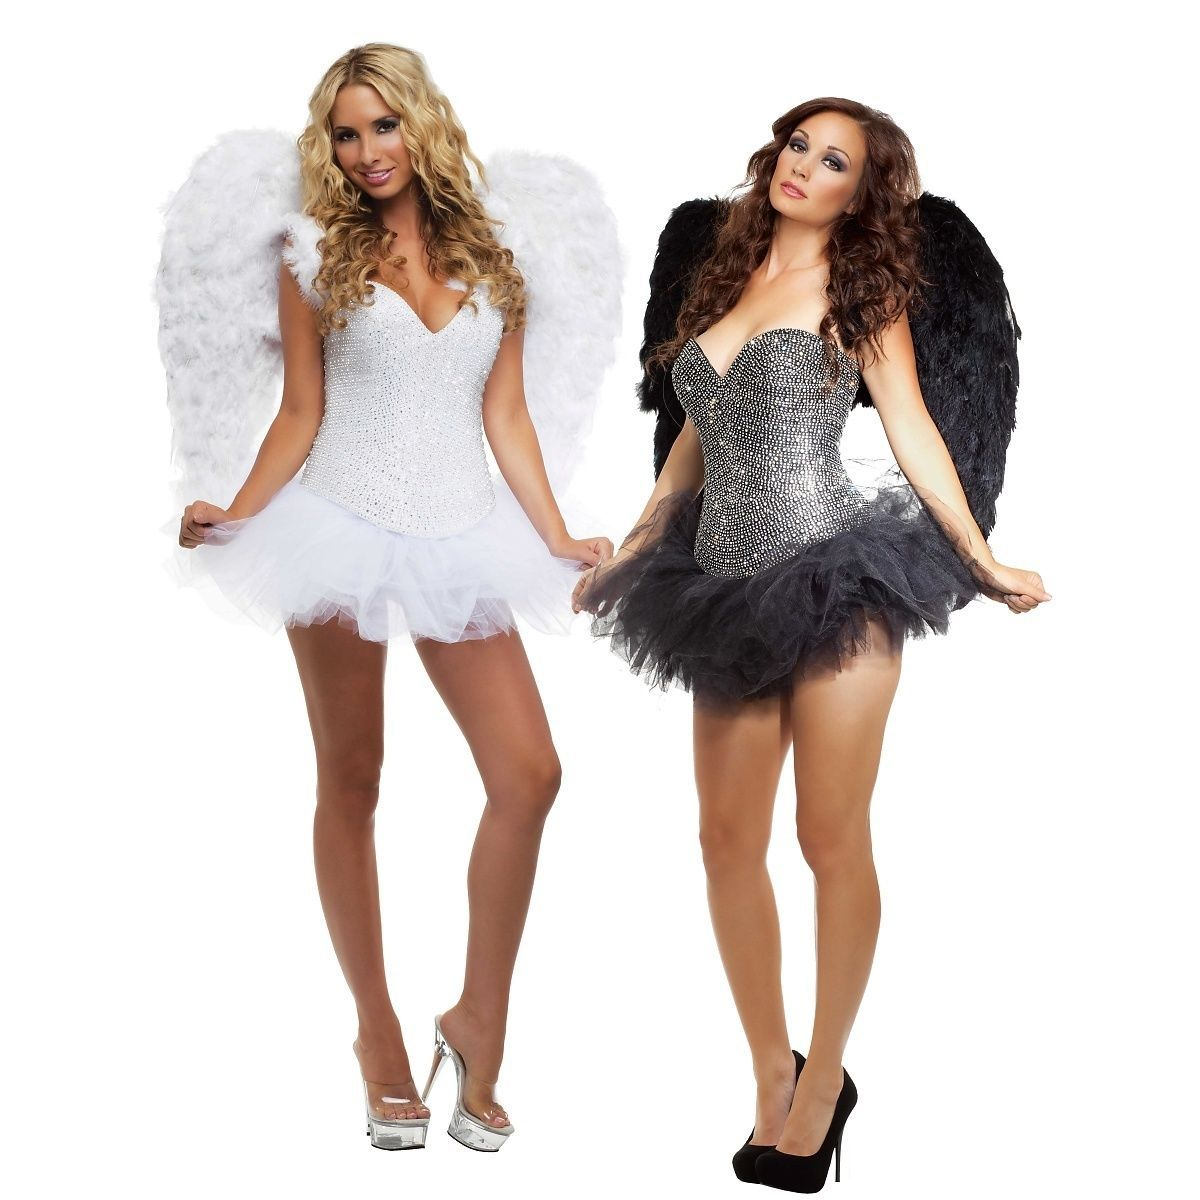 The dress halloween costume - Ultra Deluxe Signature Angel Costume For Women Sexy Adult Halloween Fancy Dress Halloween